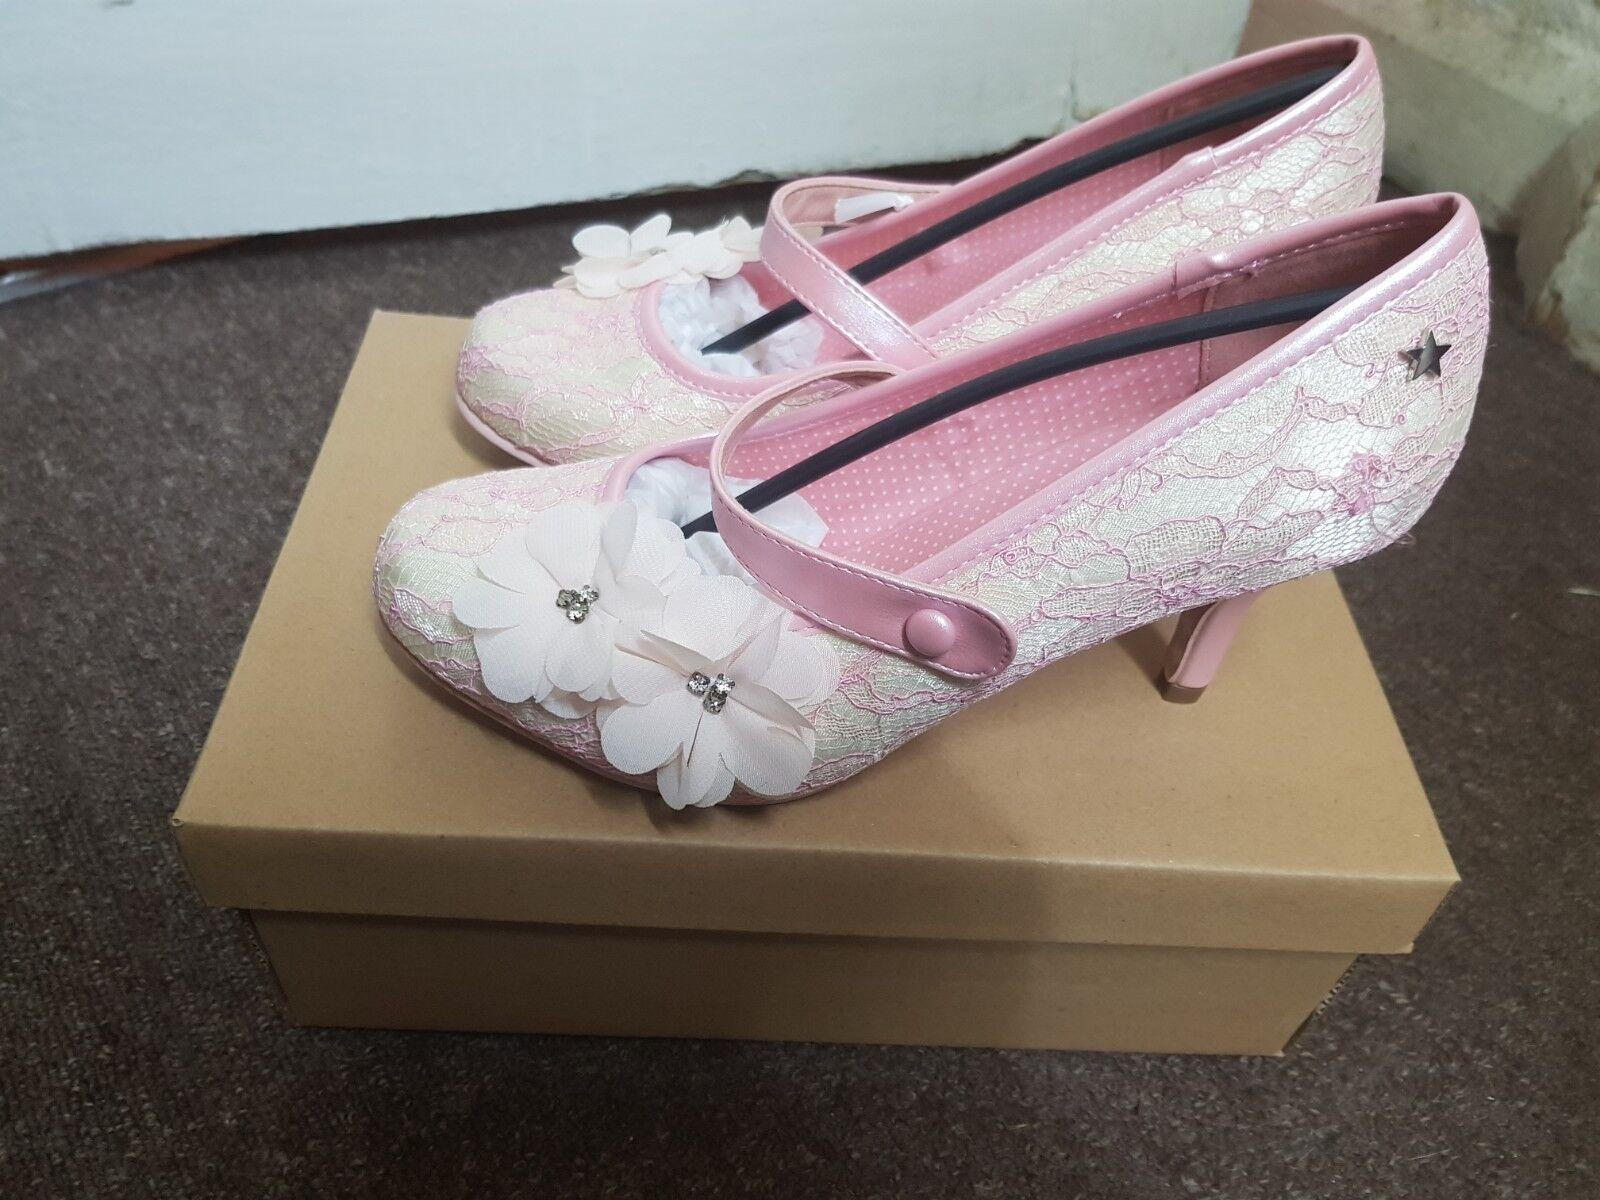 femmes Joe marrons chaussures Louisa UK Taille 5 brand new